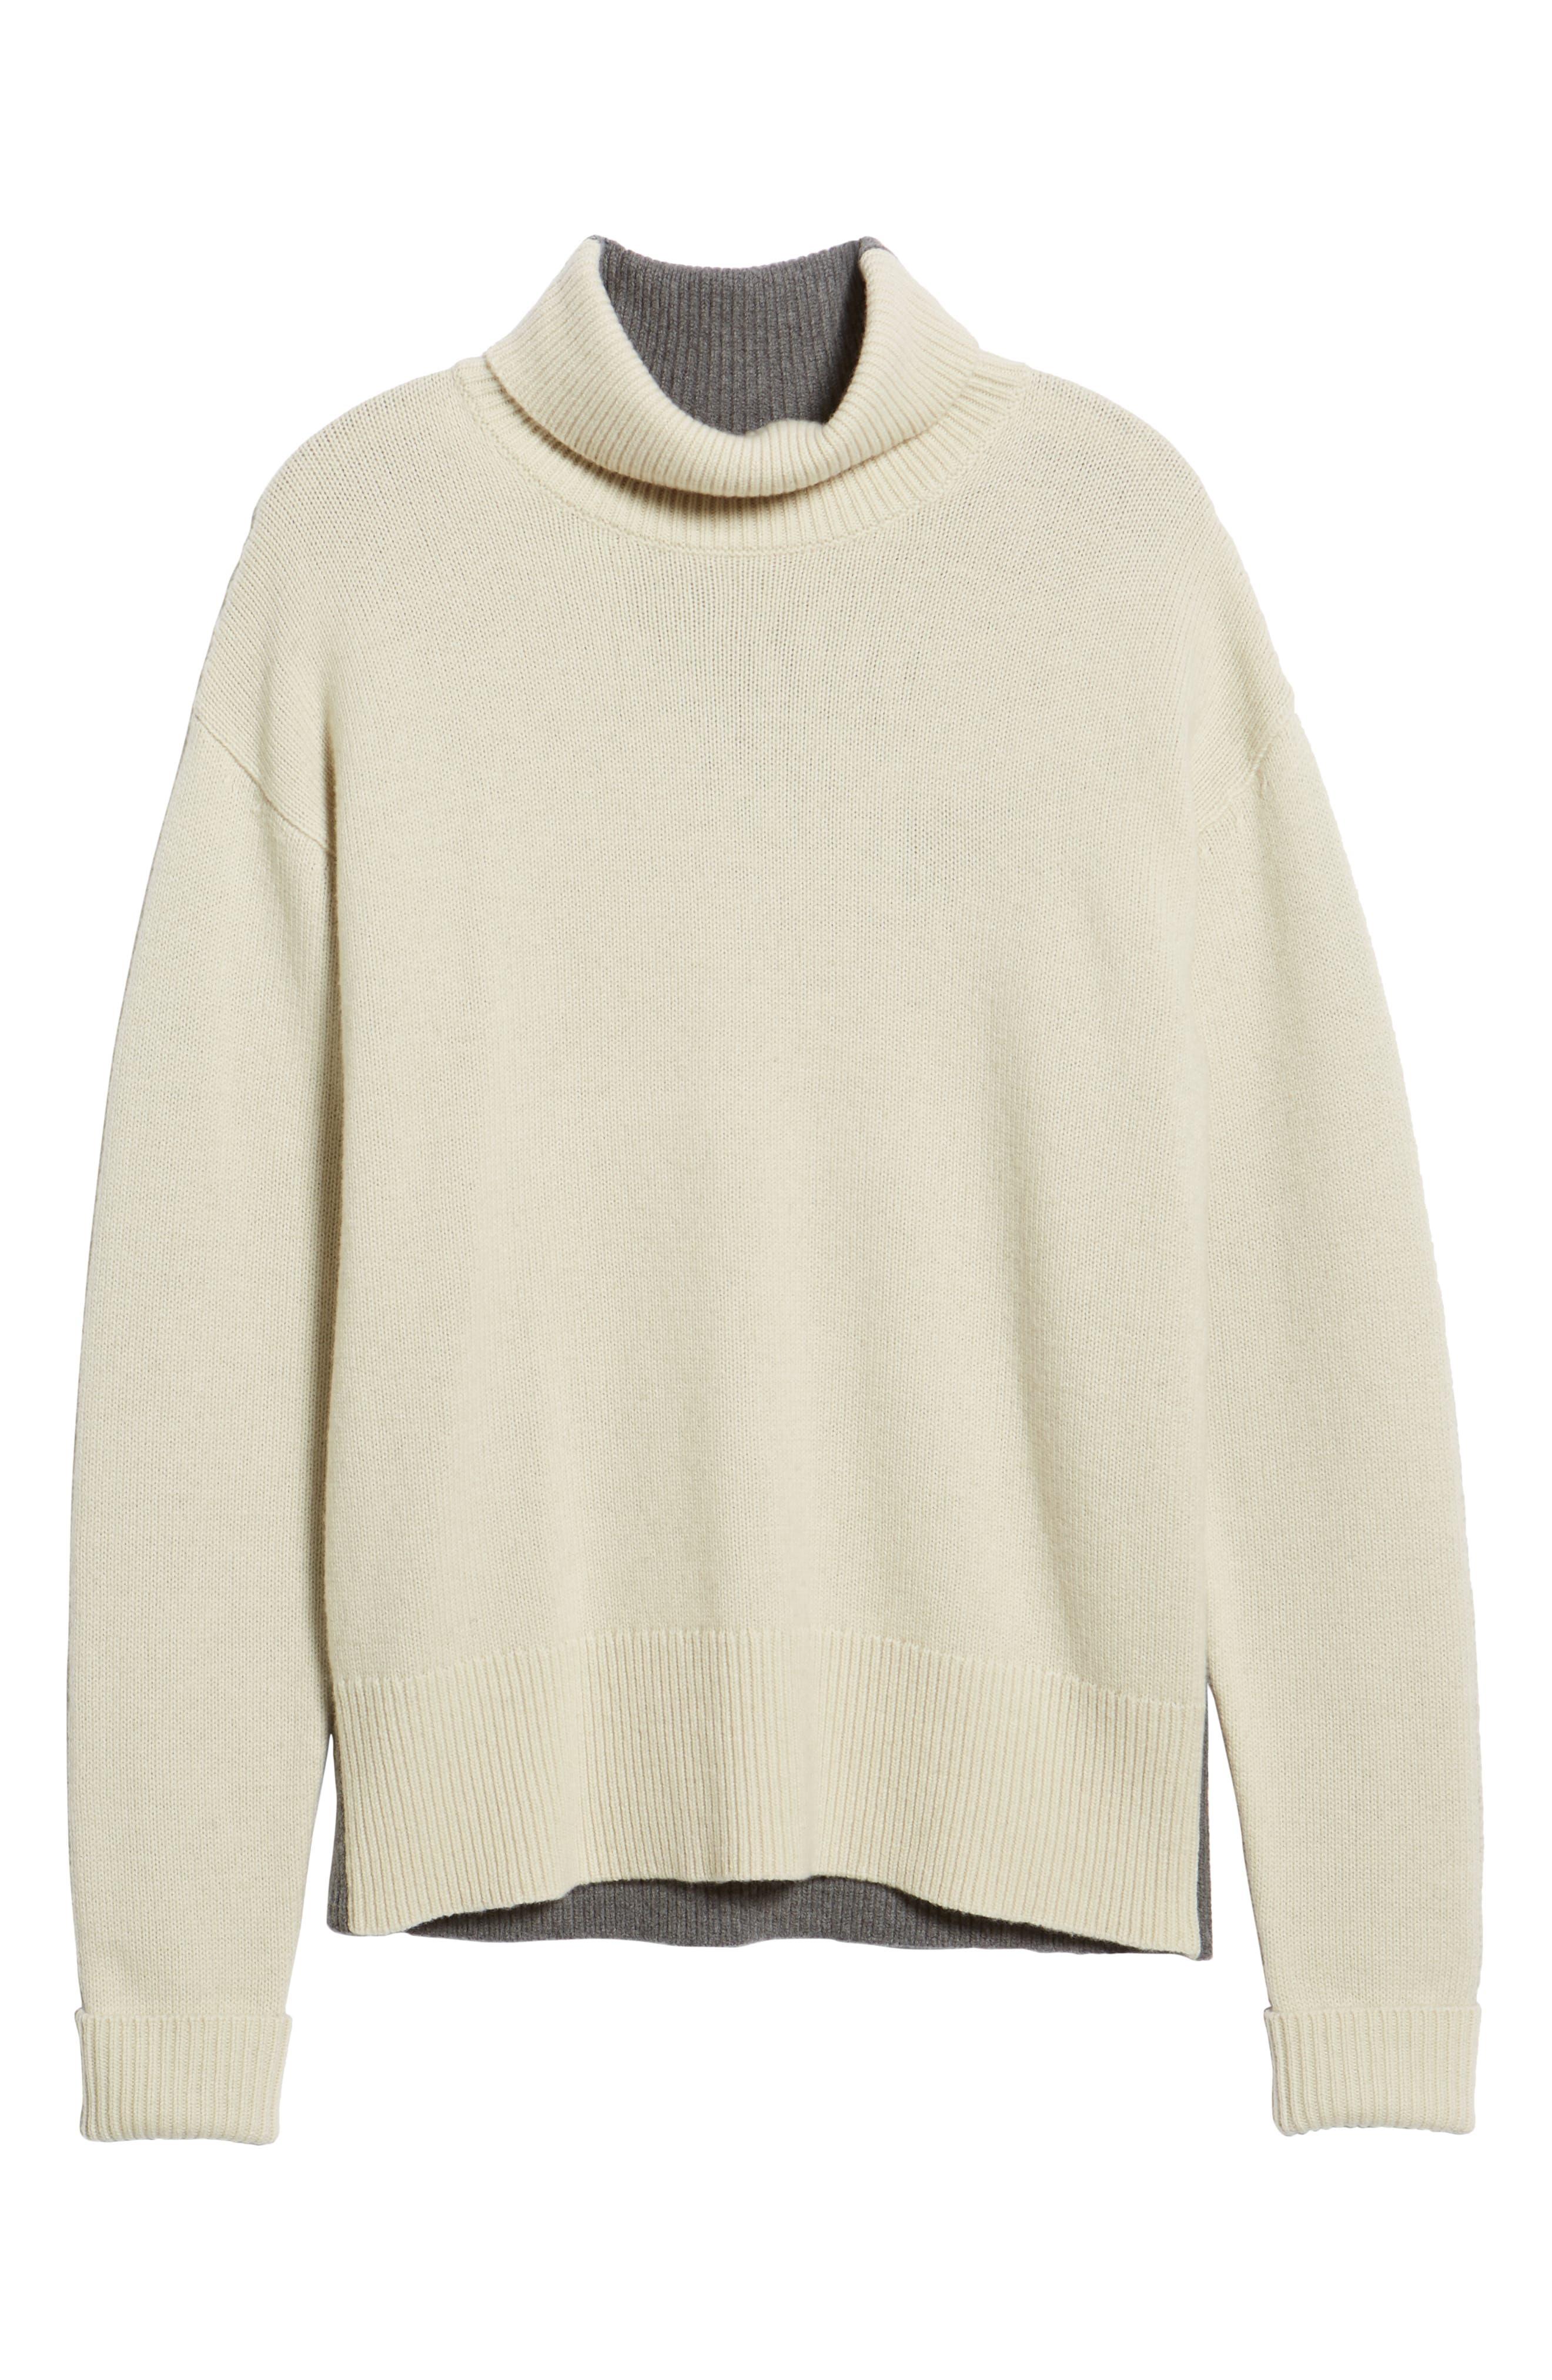 Colorblock Turtleneck Sweater,                             Alternate thumbnail 6, color,                             FOG MID GREY MELANGE